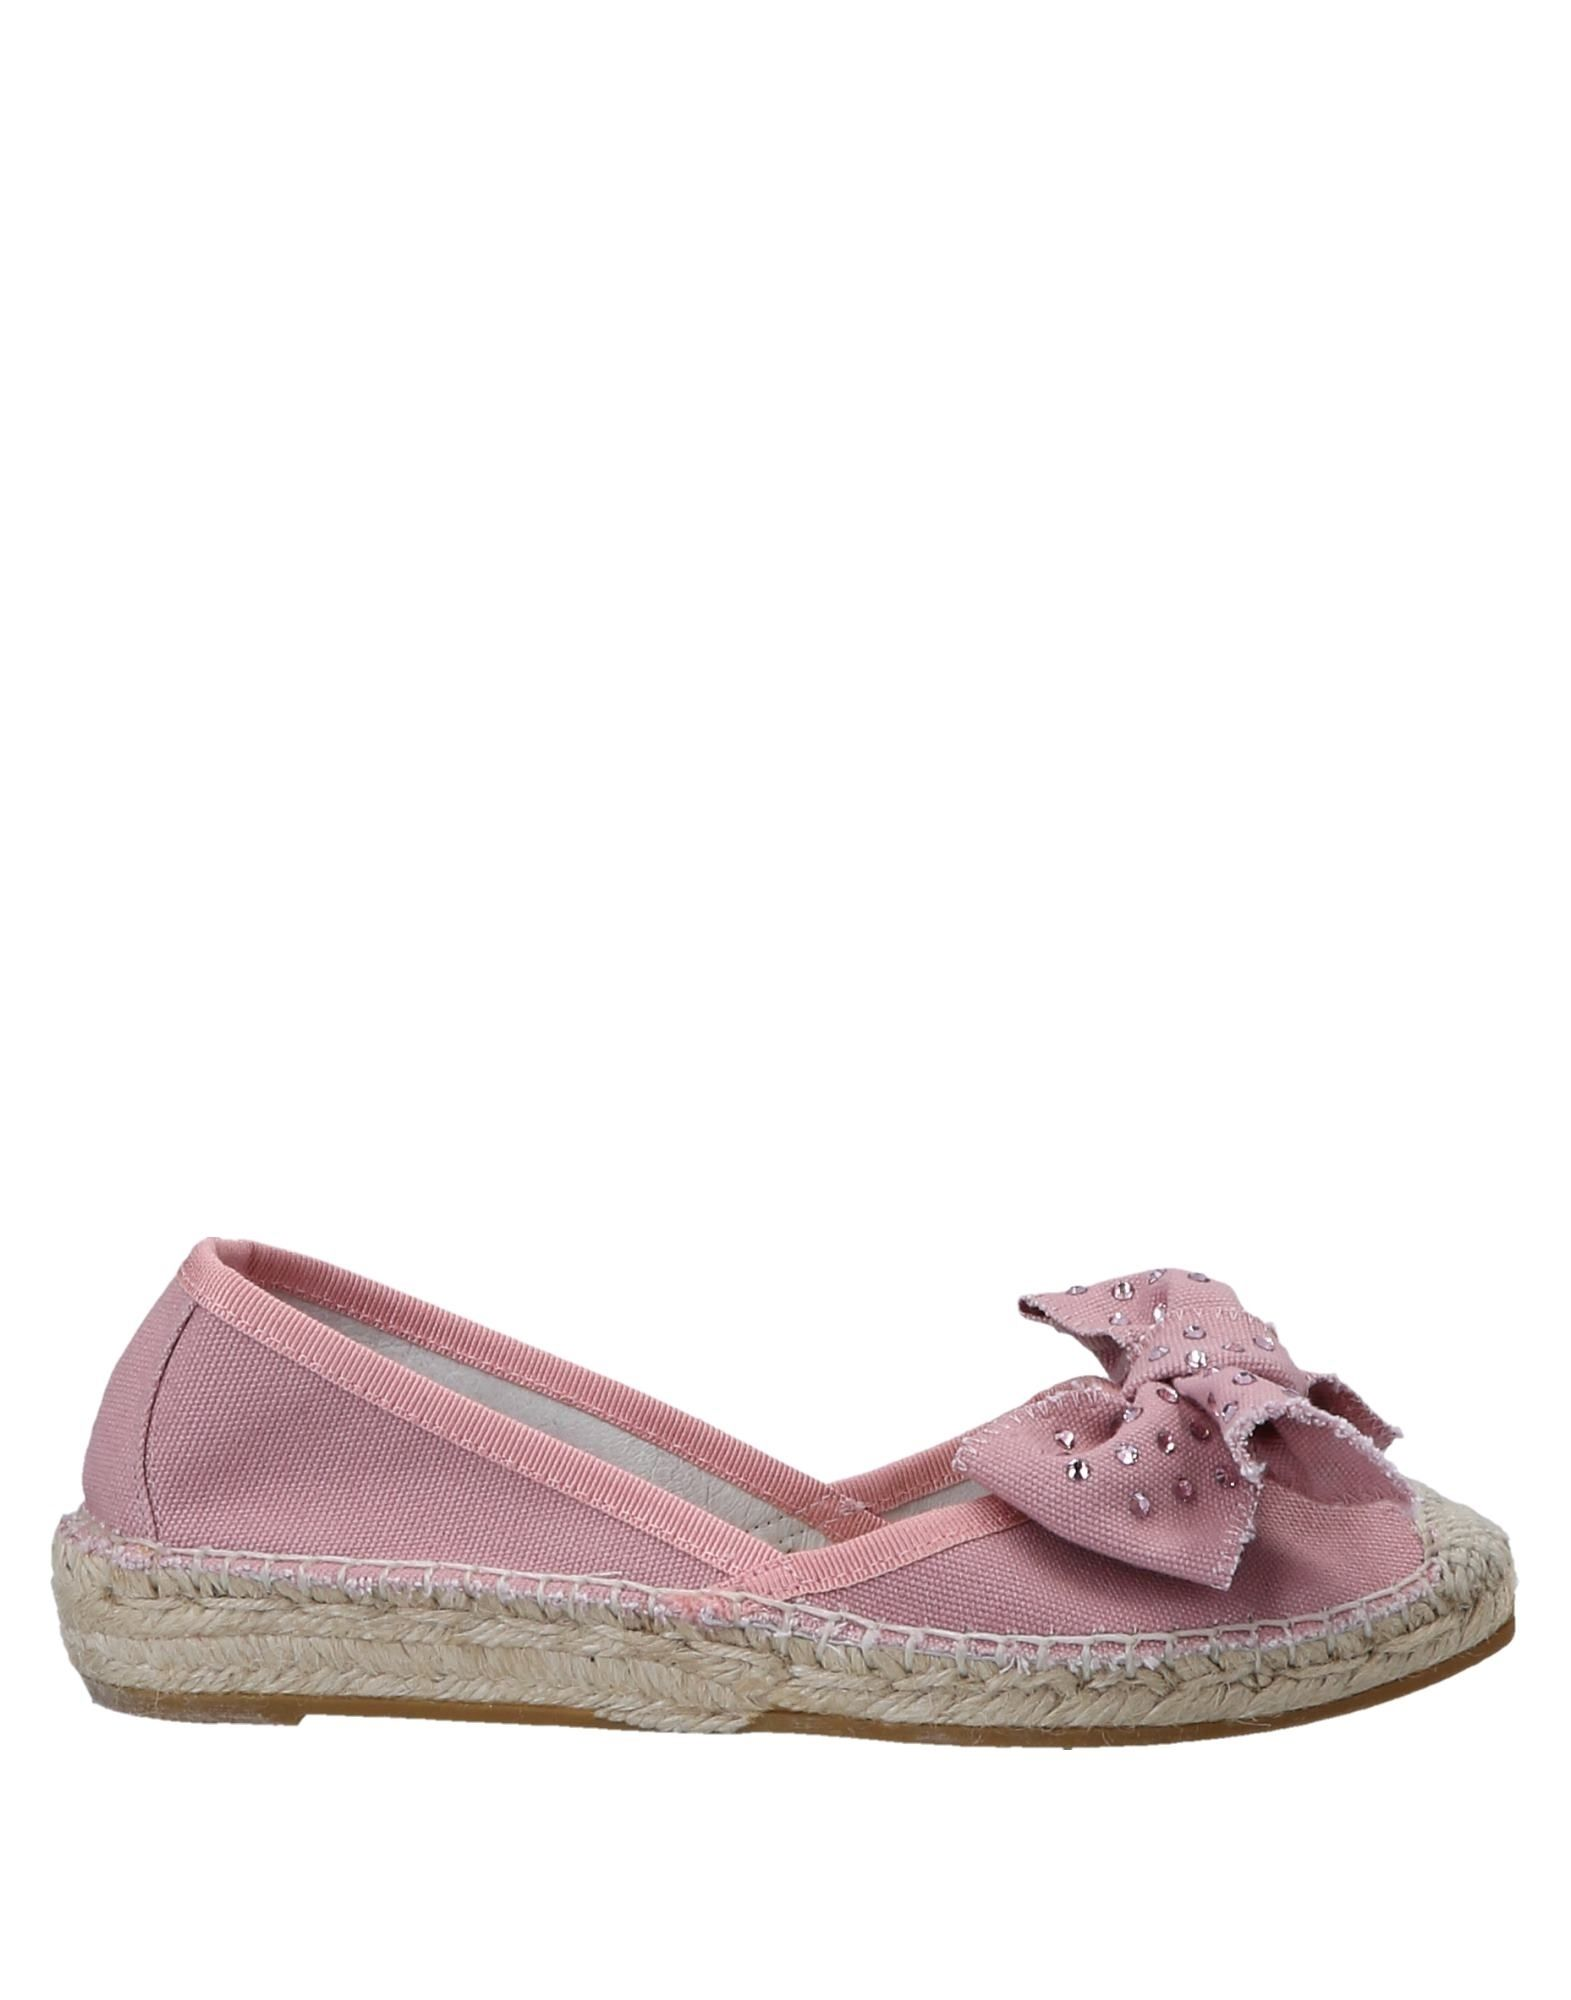 Sneakers Nuove Camper Donna - 11367400MC Nuove Sneakers offerte e scarpe comode 0f5ee5